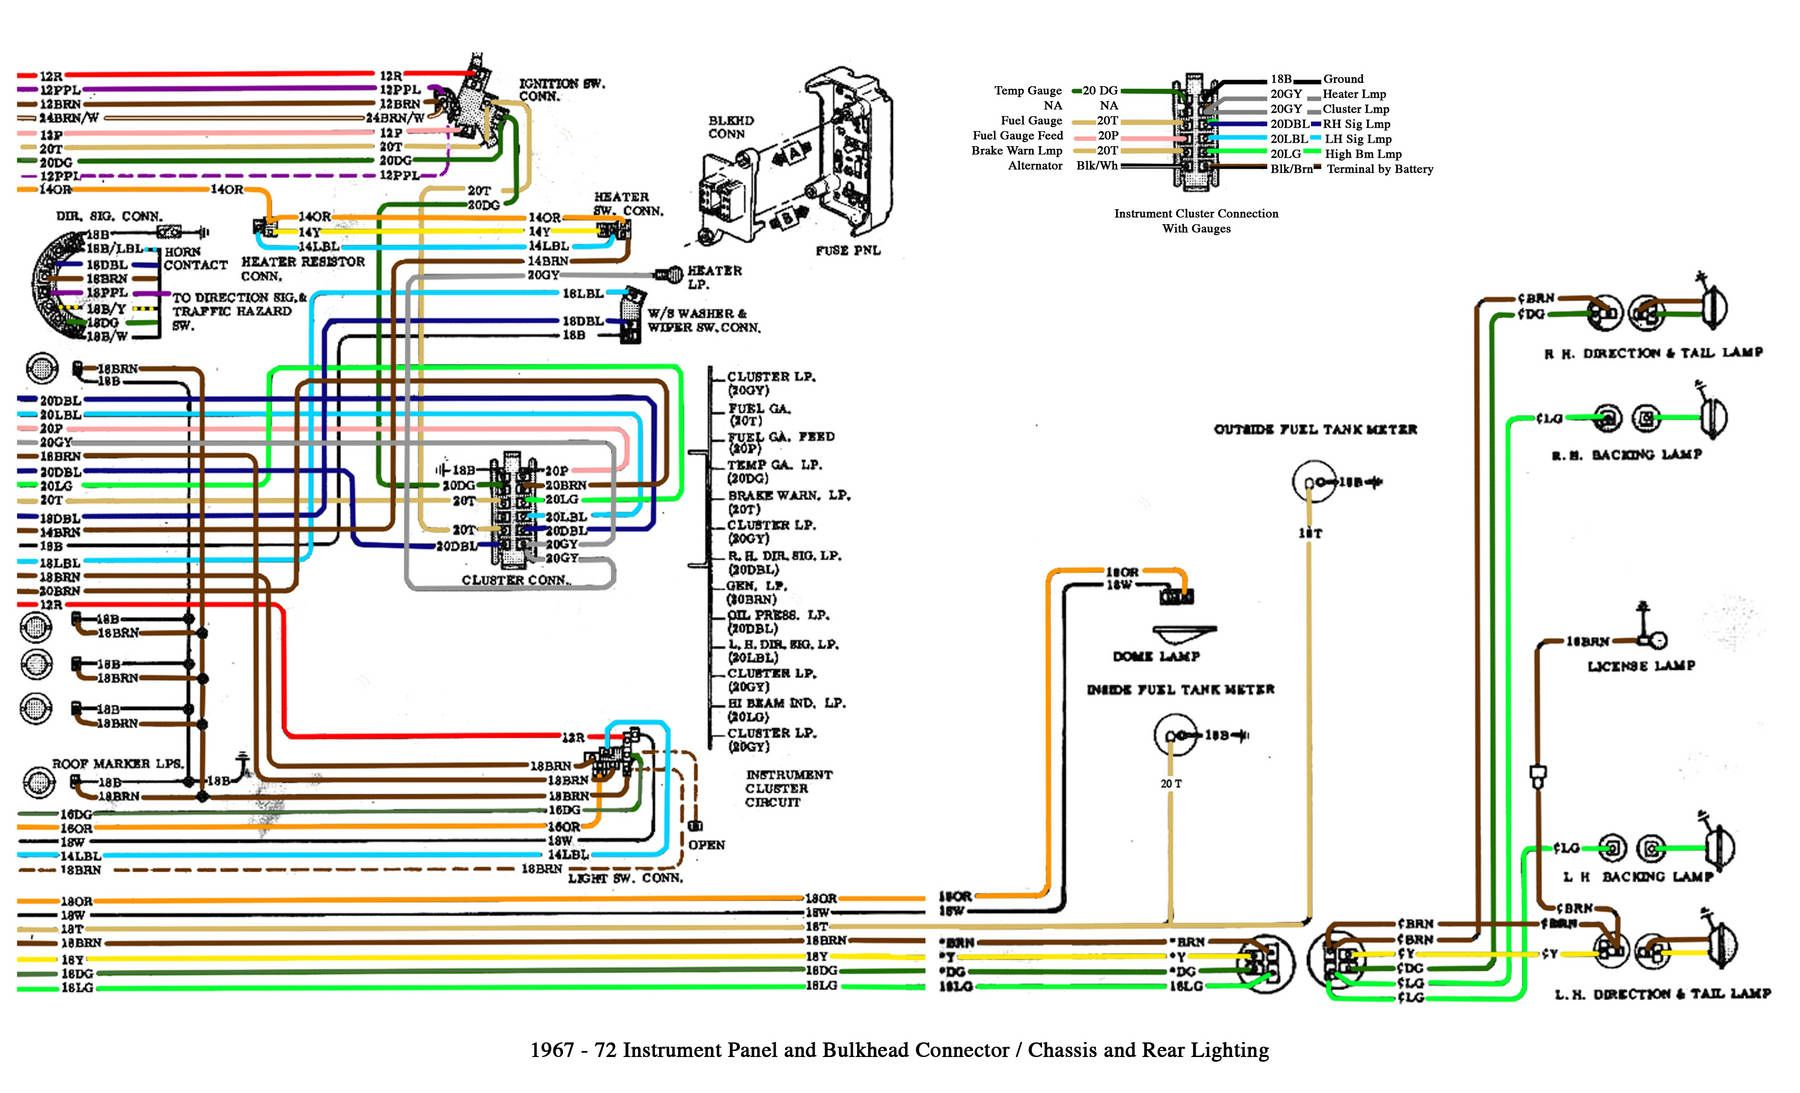 wiring diagram | Bryan's old truck | 72 chevy truck, Chevy